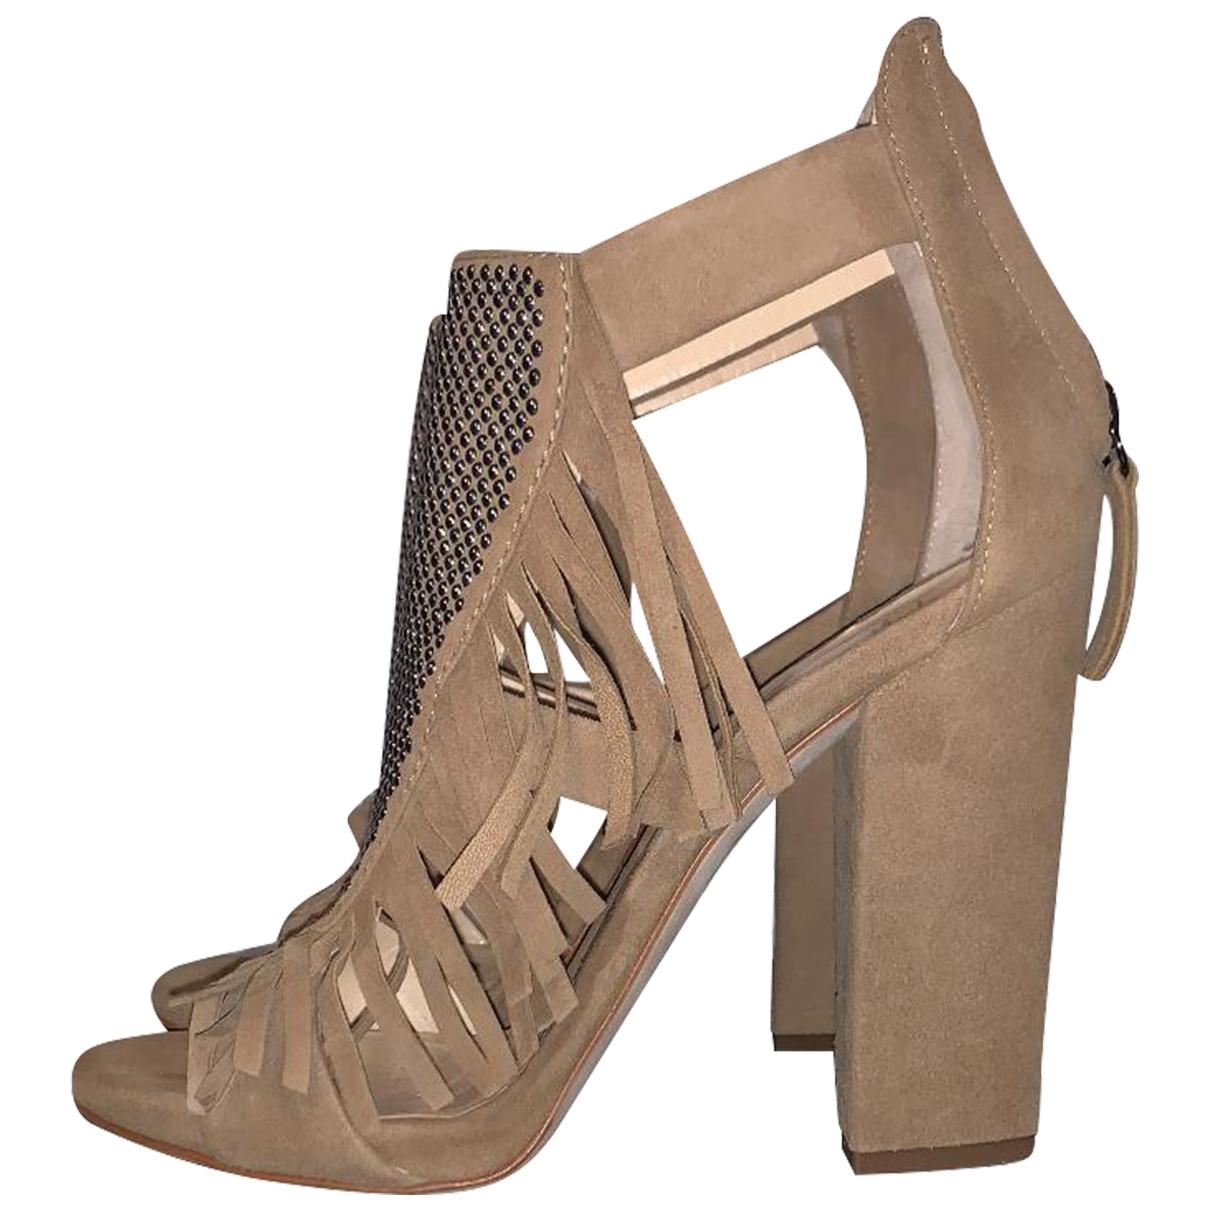 Giuseppe Zanotti \N Beige Suede Sandals for Women 37 EU